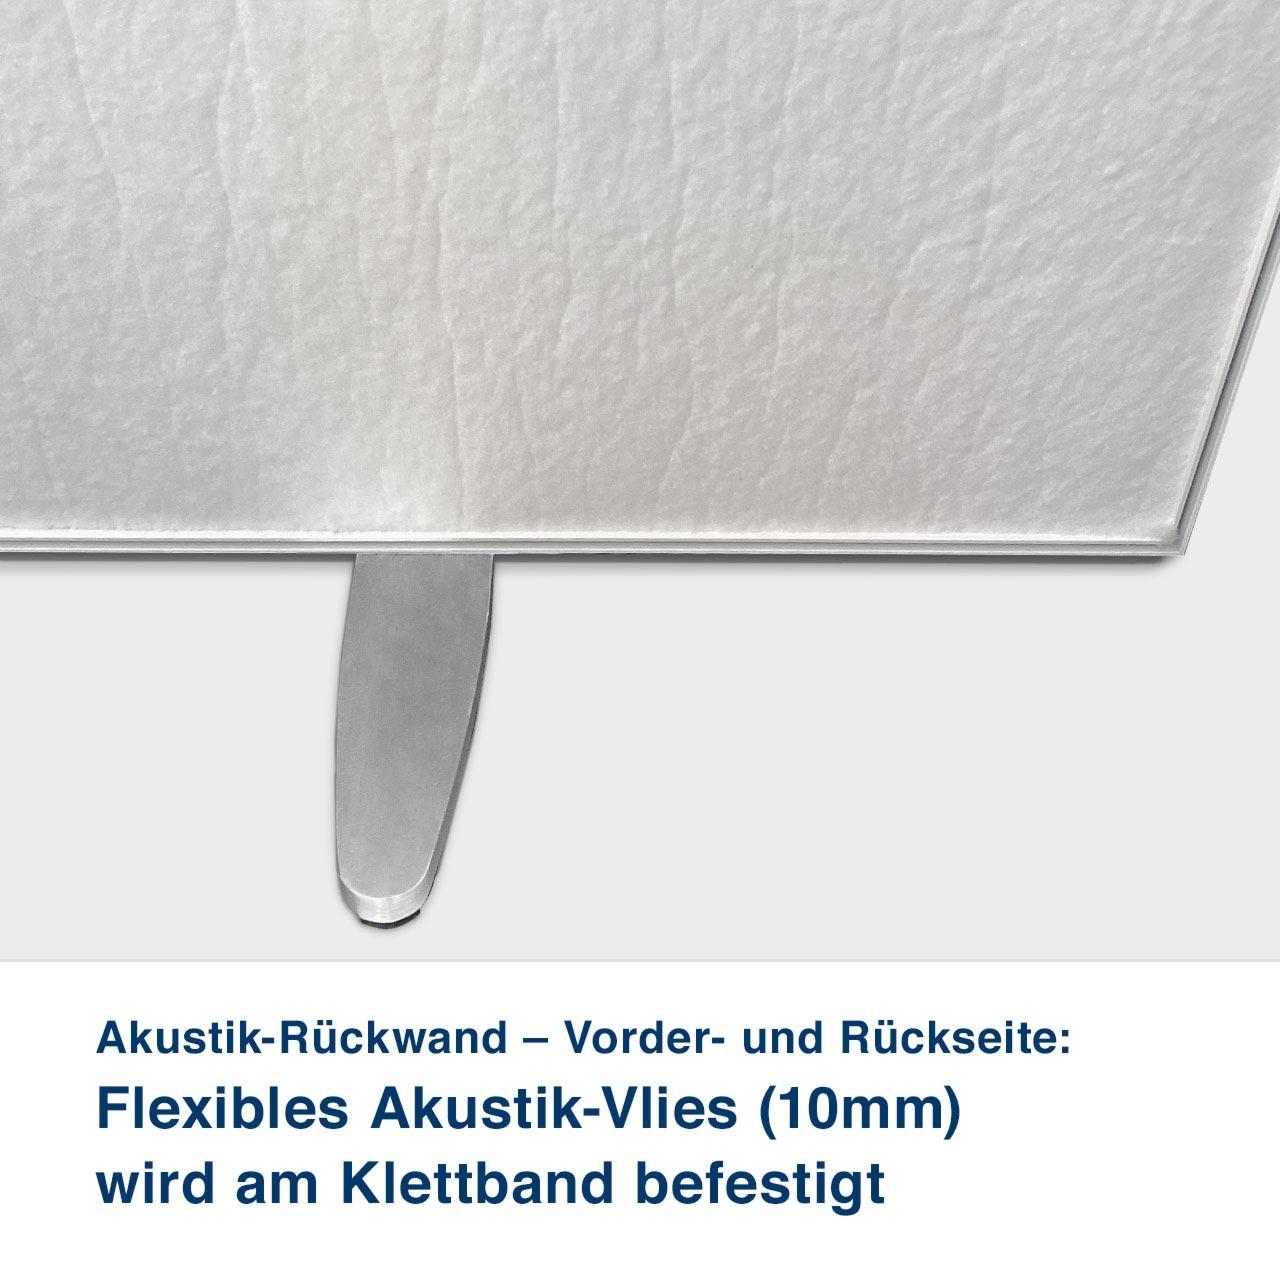 Akustik-Rückwand – Akustikvlies::   Feste Akustikplatte (18mm) wird  am Klettband befestigt – Vorderseite